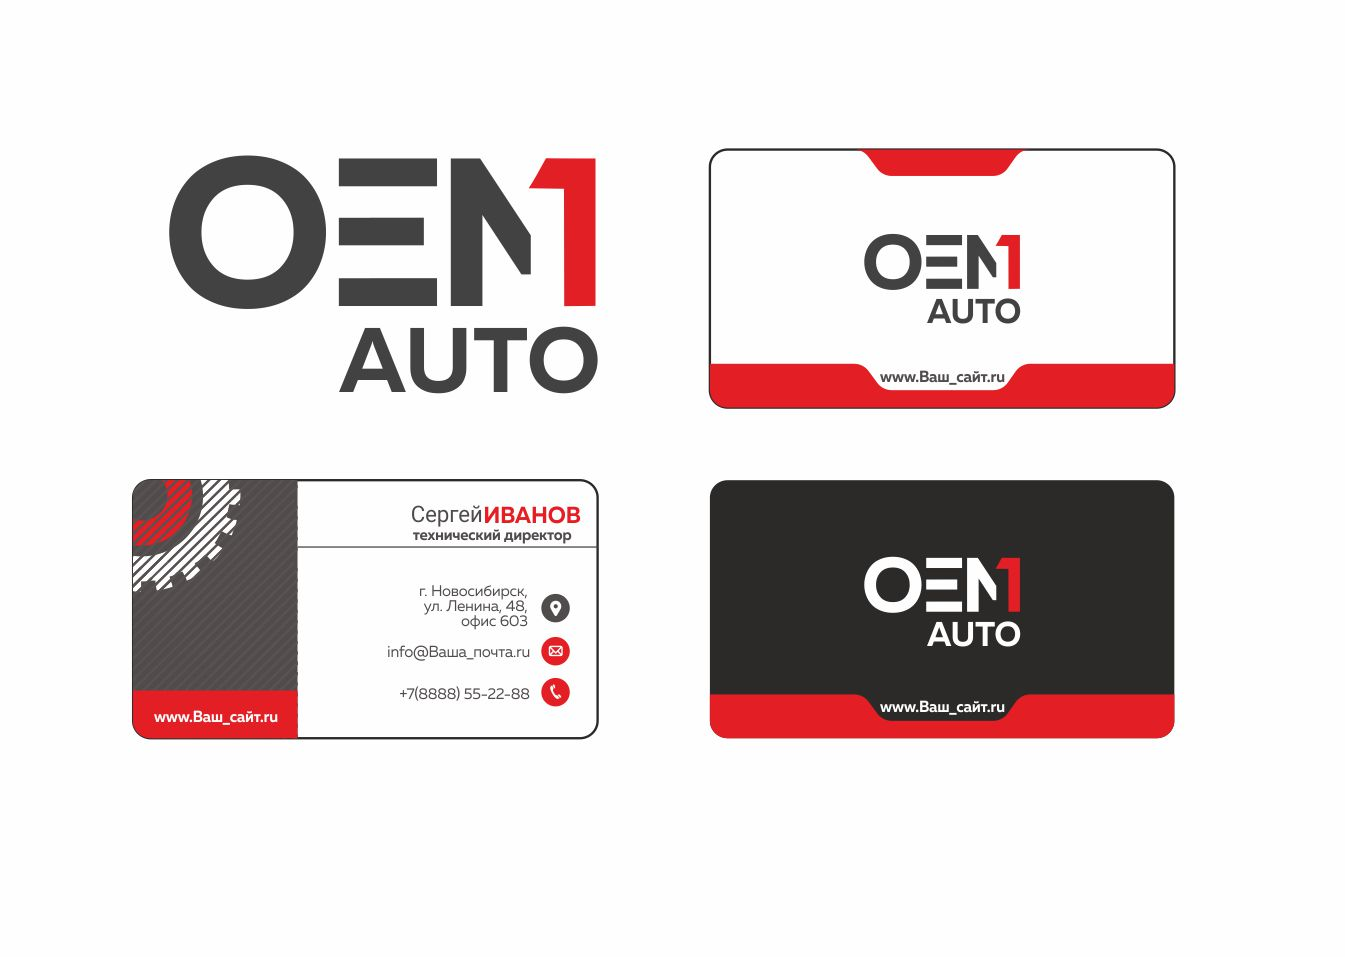 Разработать логотип и дизайн визитки  фото f_3585b681d0dbb903.jpg